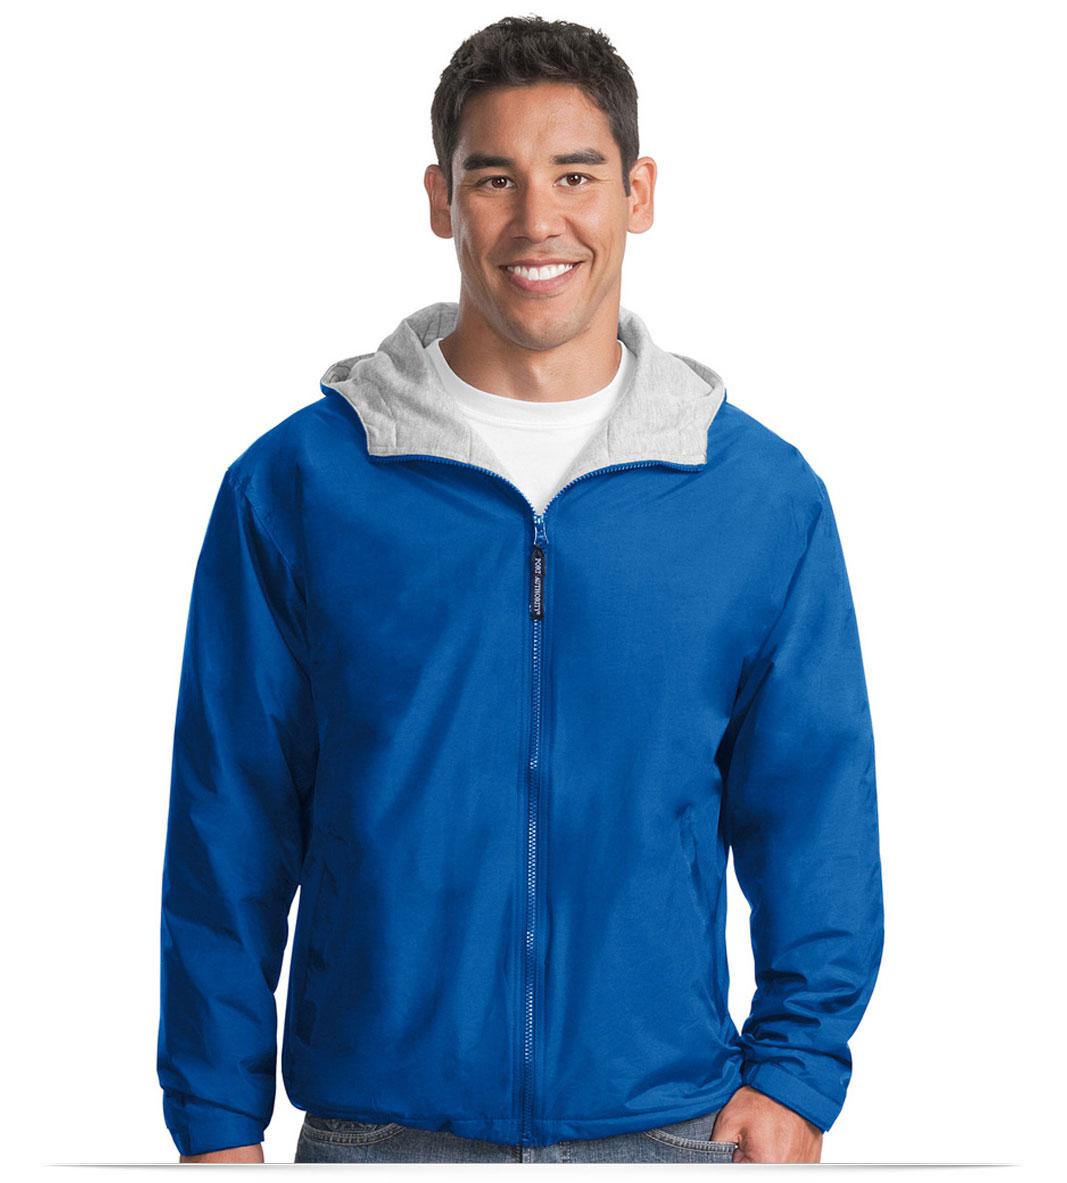 Customize Team Jacket